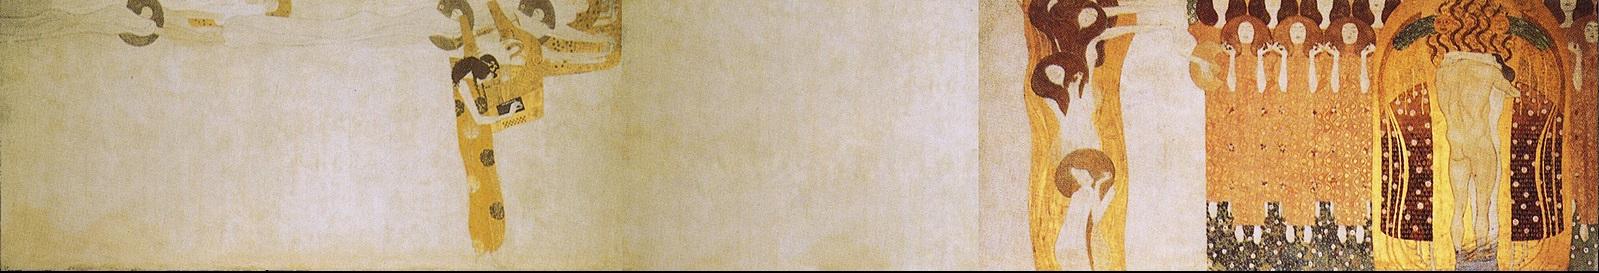 Gustav Klimt Beethoven Frieze   art-Klimt.com